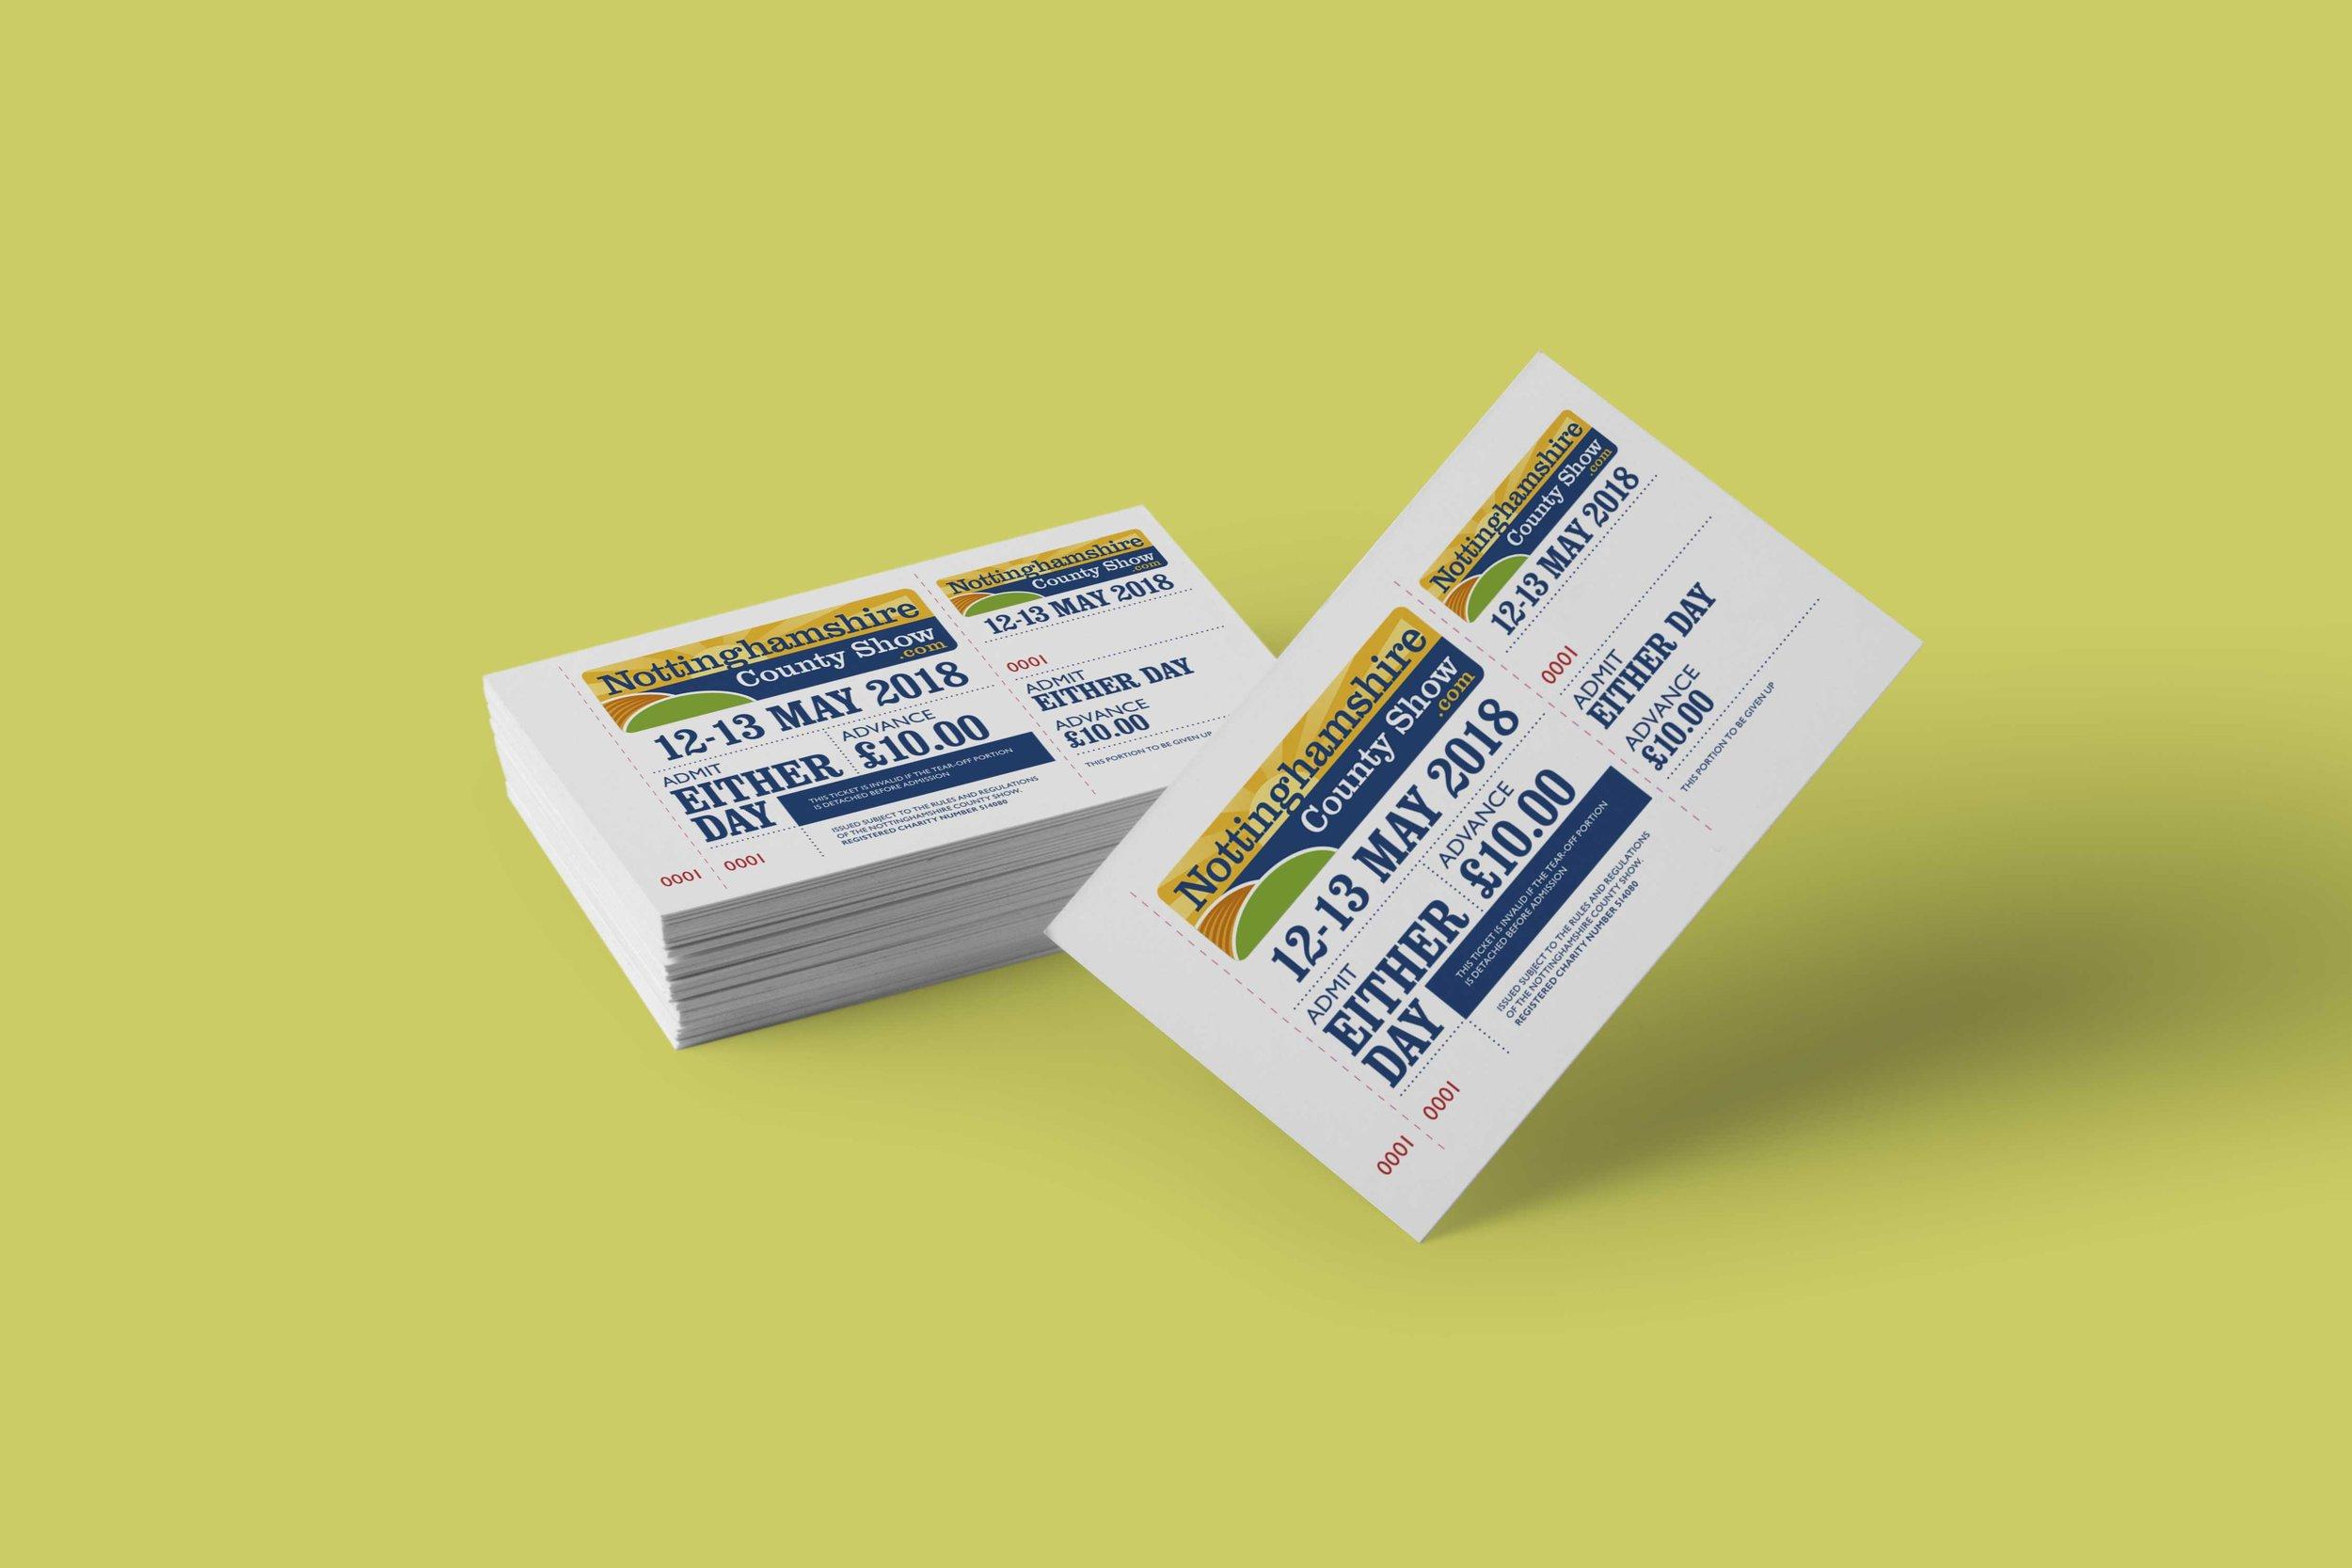 Notts-County-Show-ticket-design.jpg